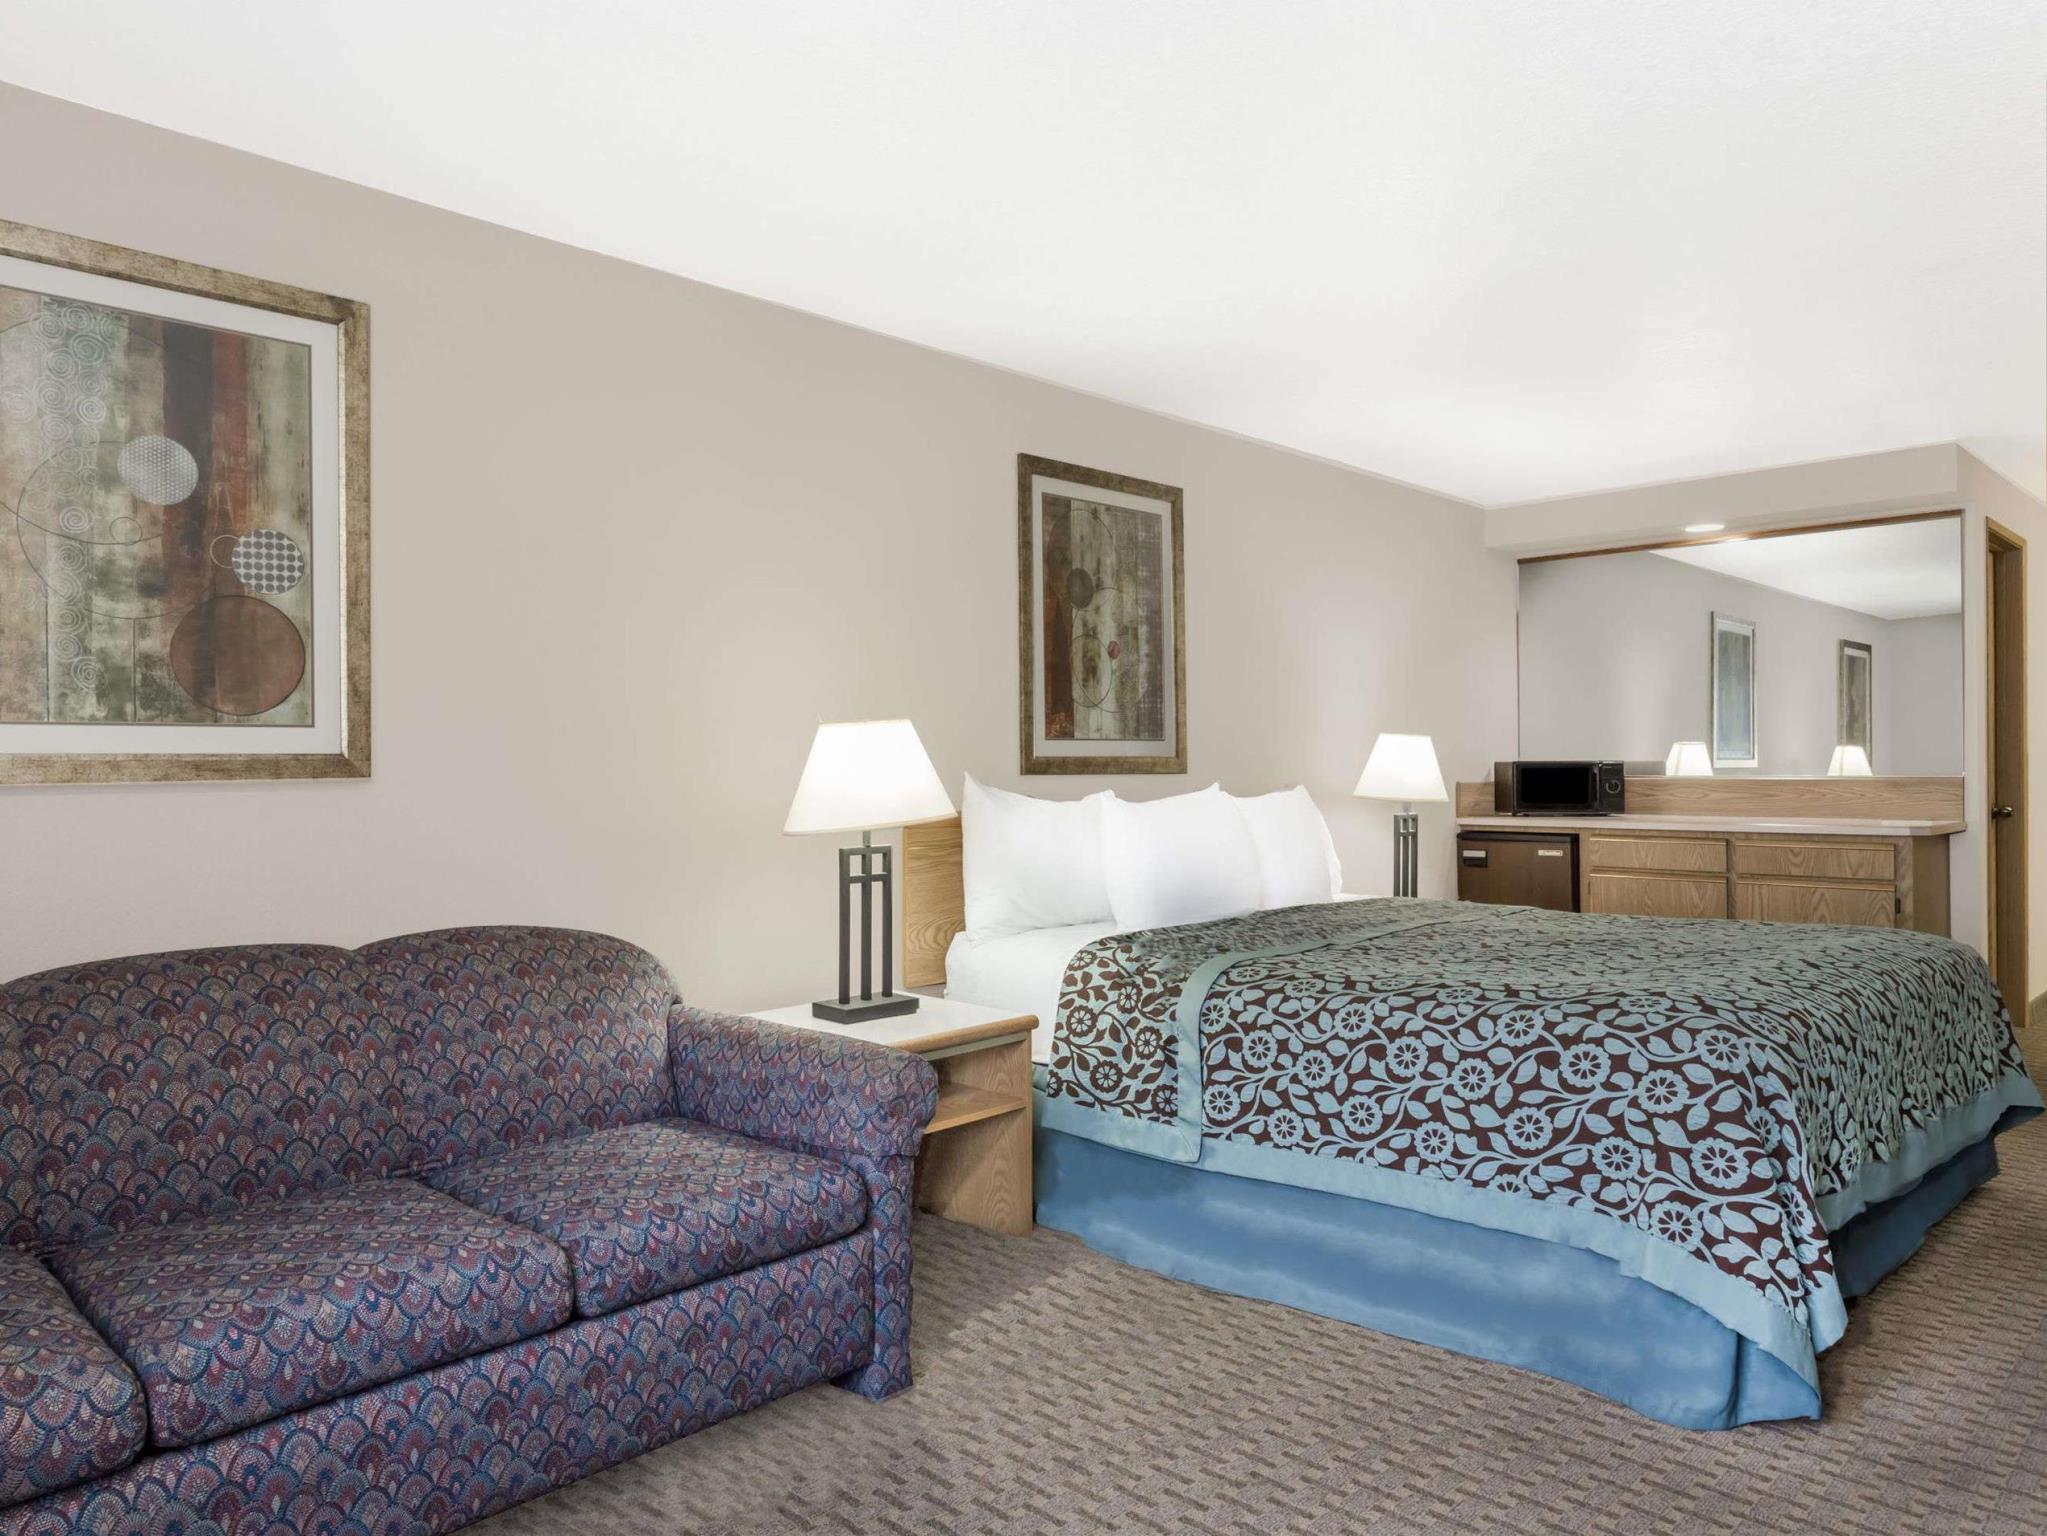 Days Inn & Suites By Wyndham Kanab